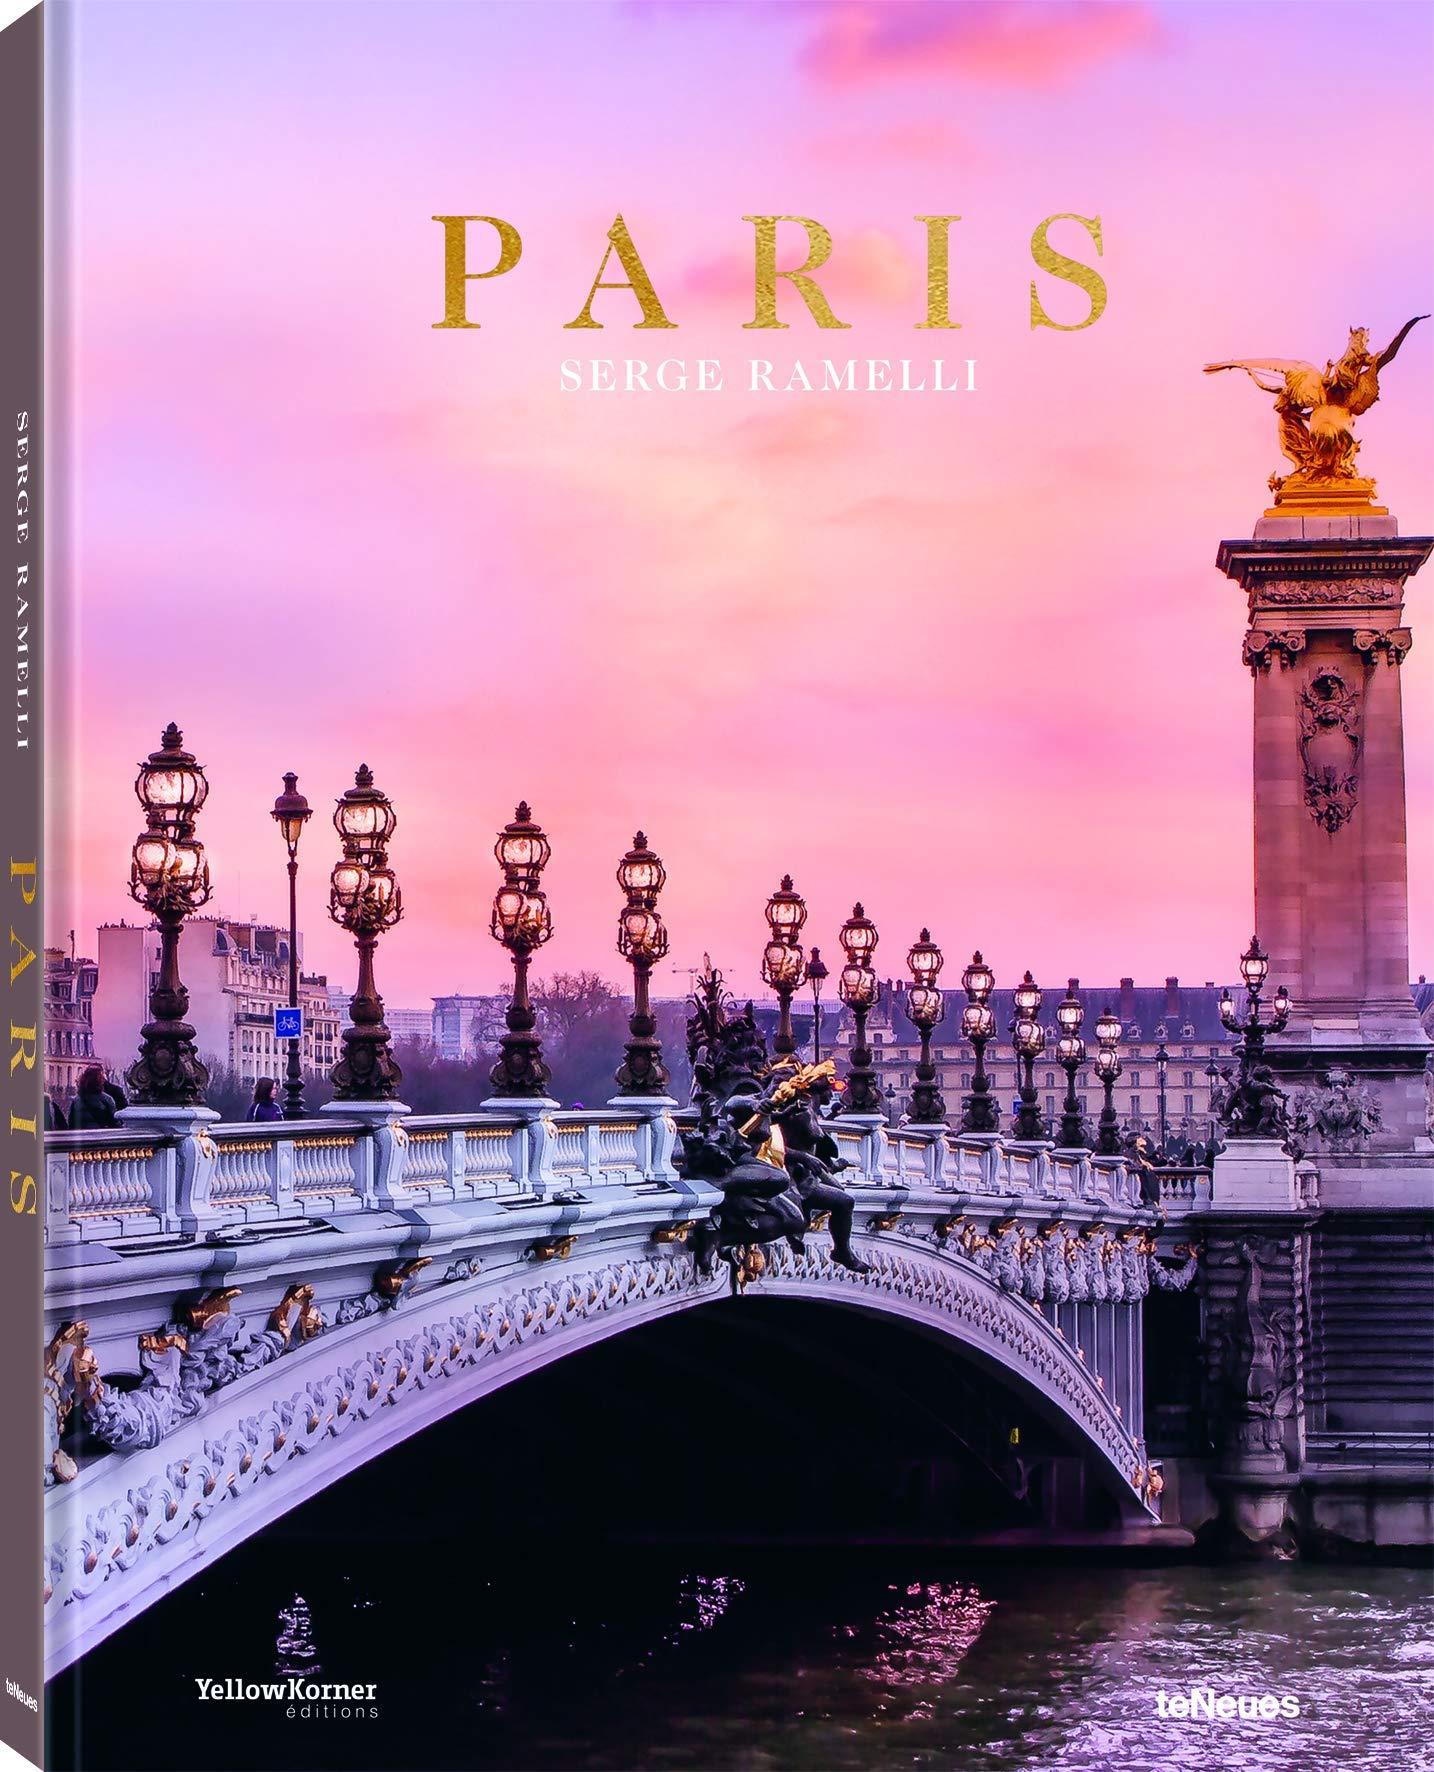 Paris (Photographer) [Idioma Inglés]: Amazon.es: Ramelli, Serge, Rehkopf, K., Jany, C.: Libros en idiomas extranjeros